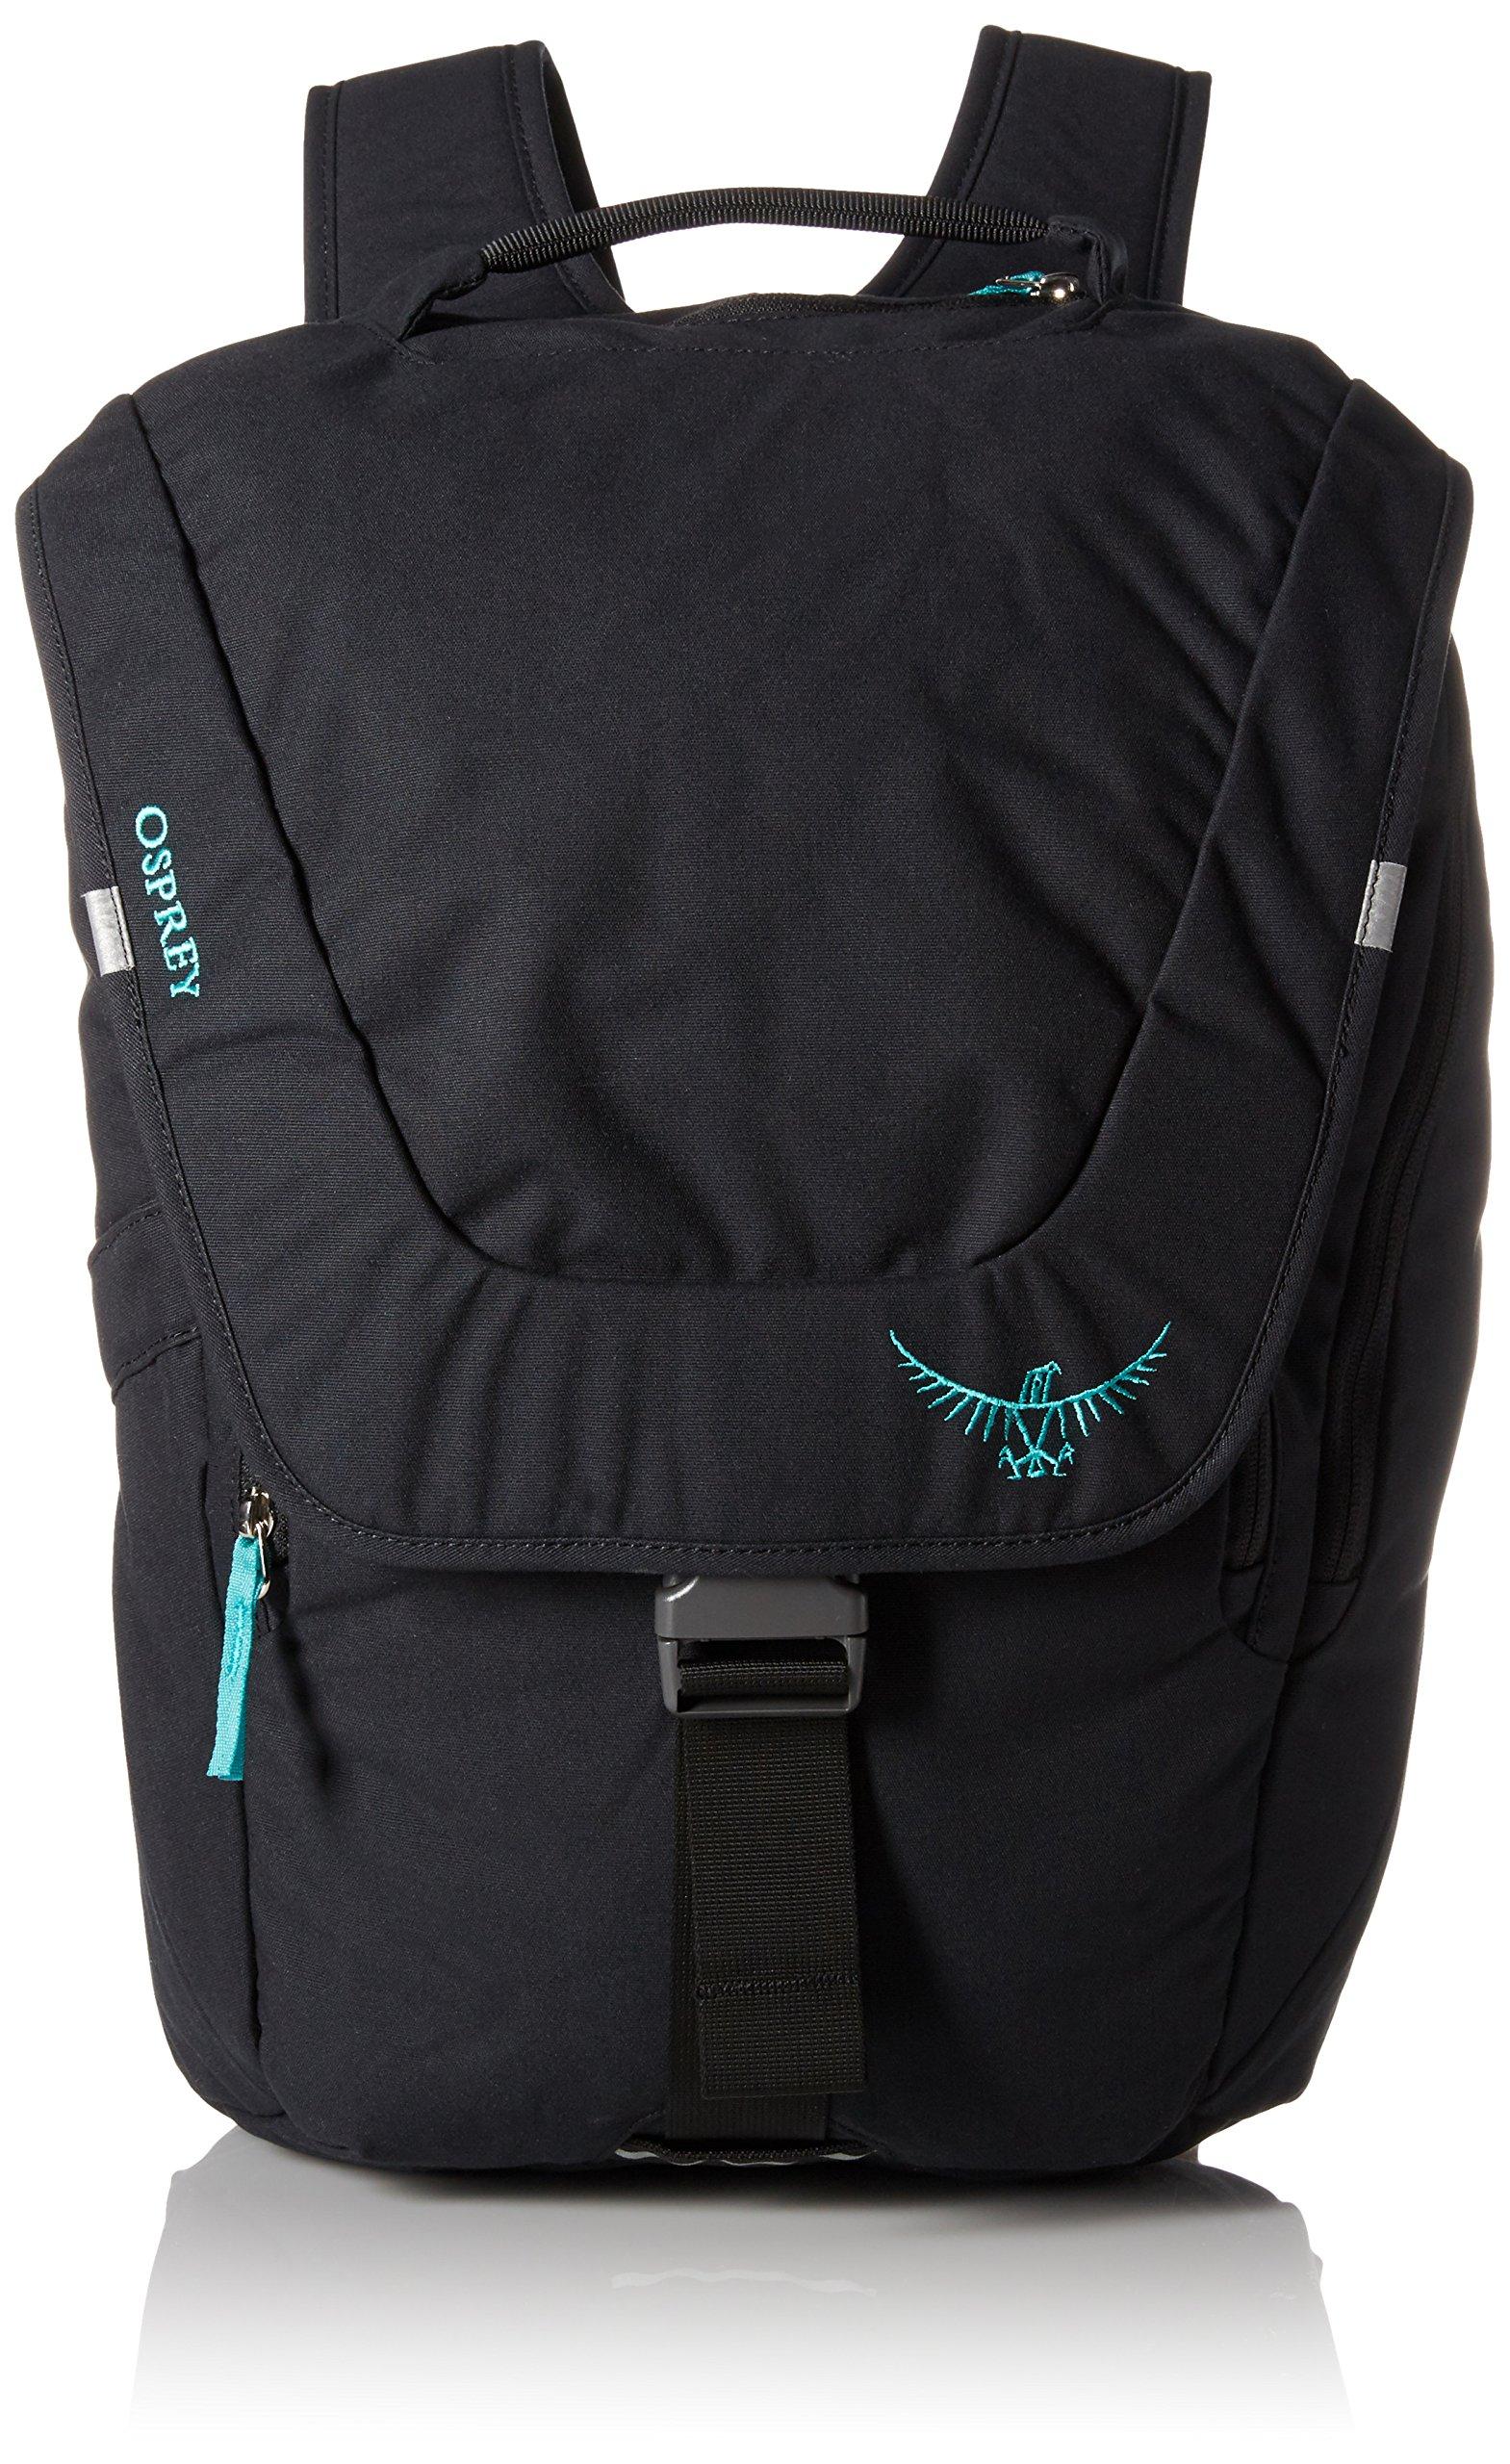 Osprey Women's FlapJill Backpack, Black, One Size by Osprey